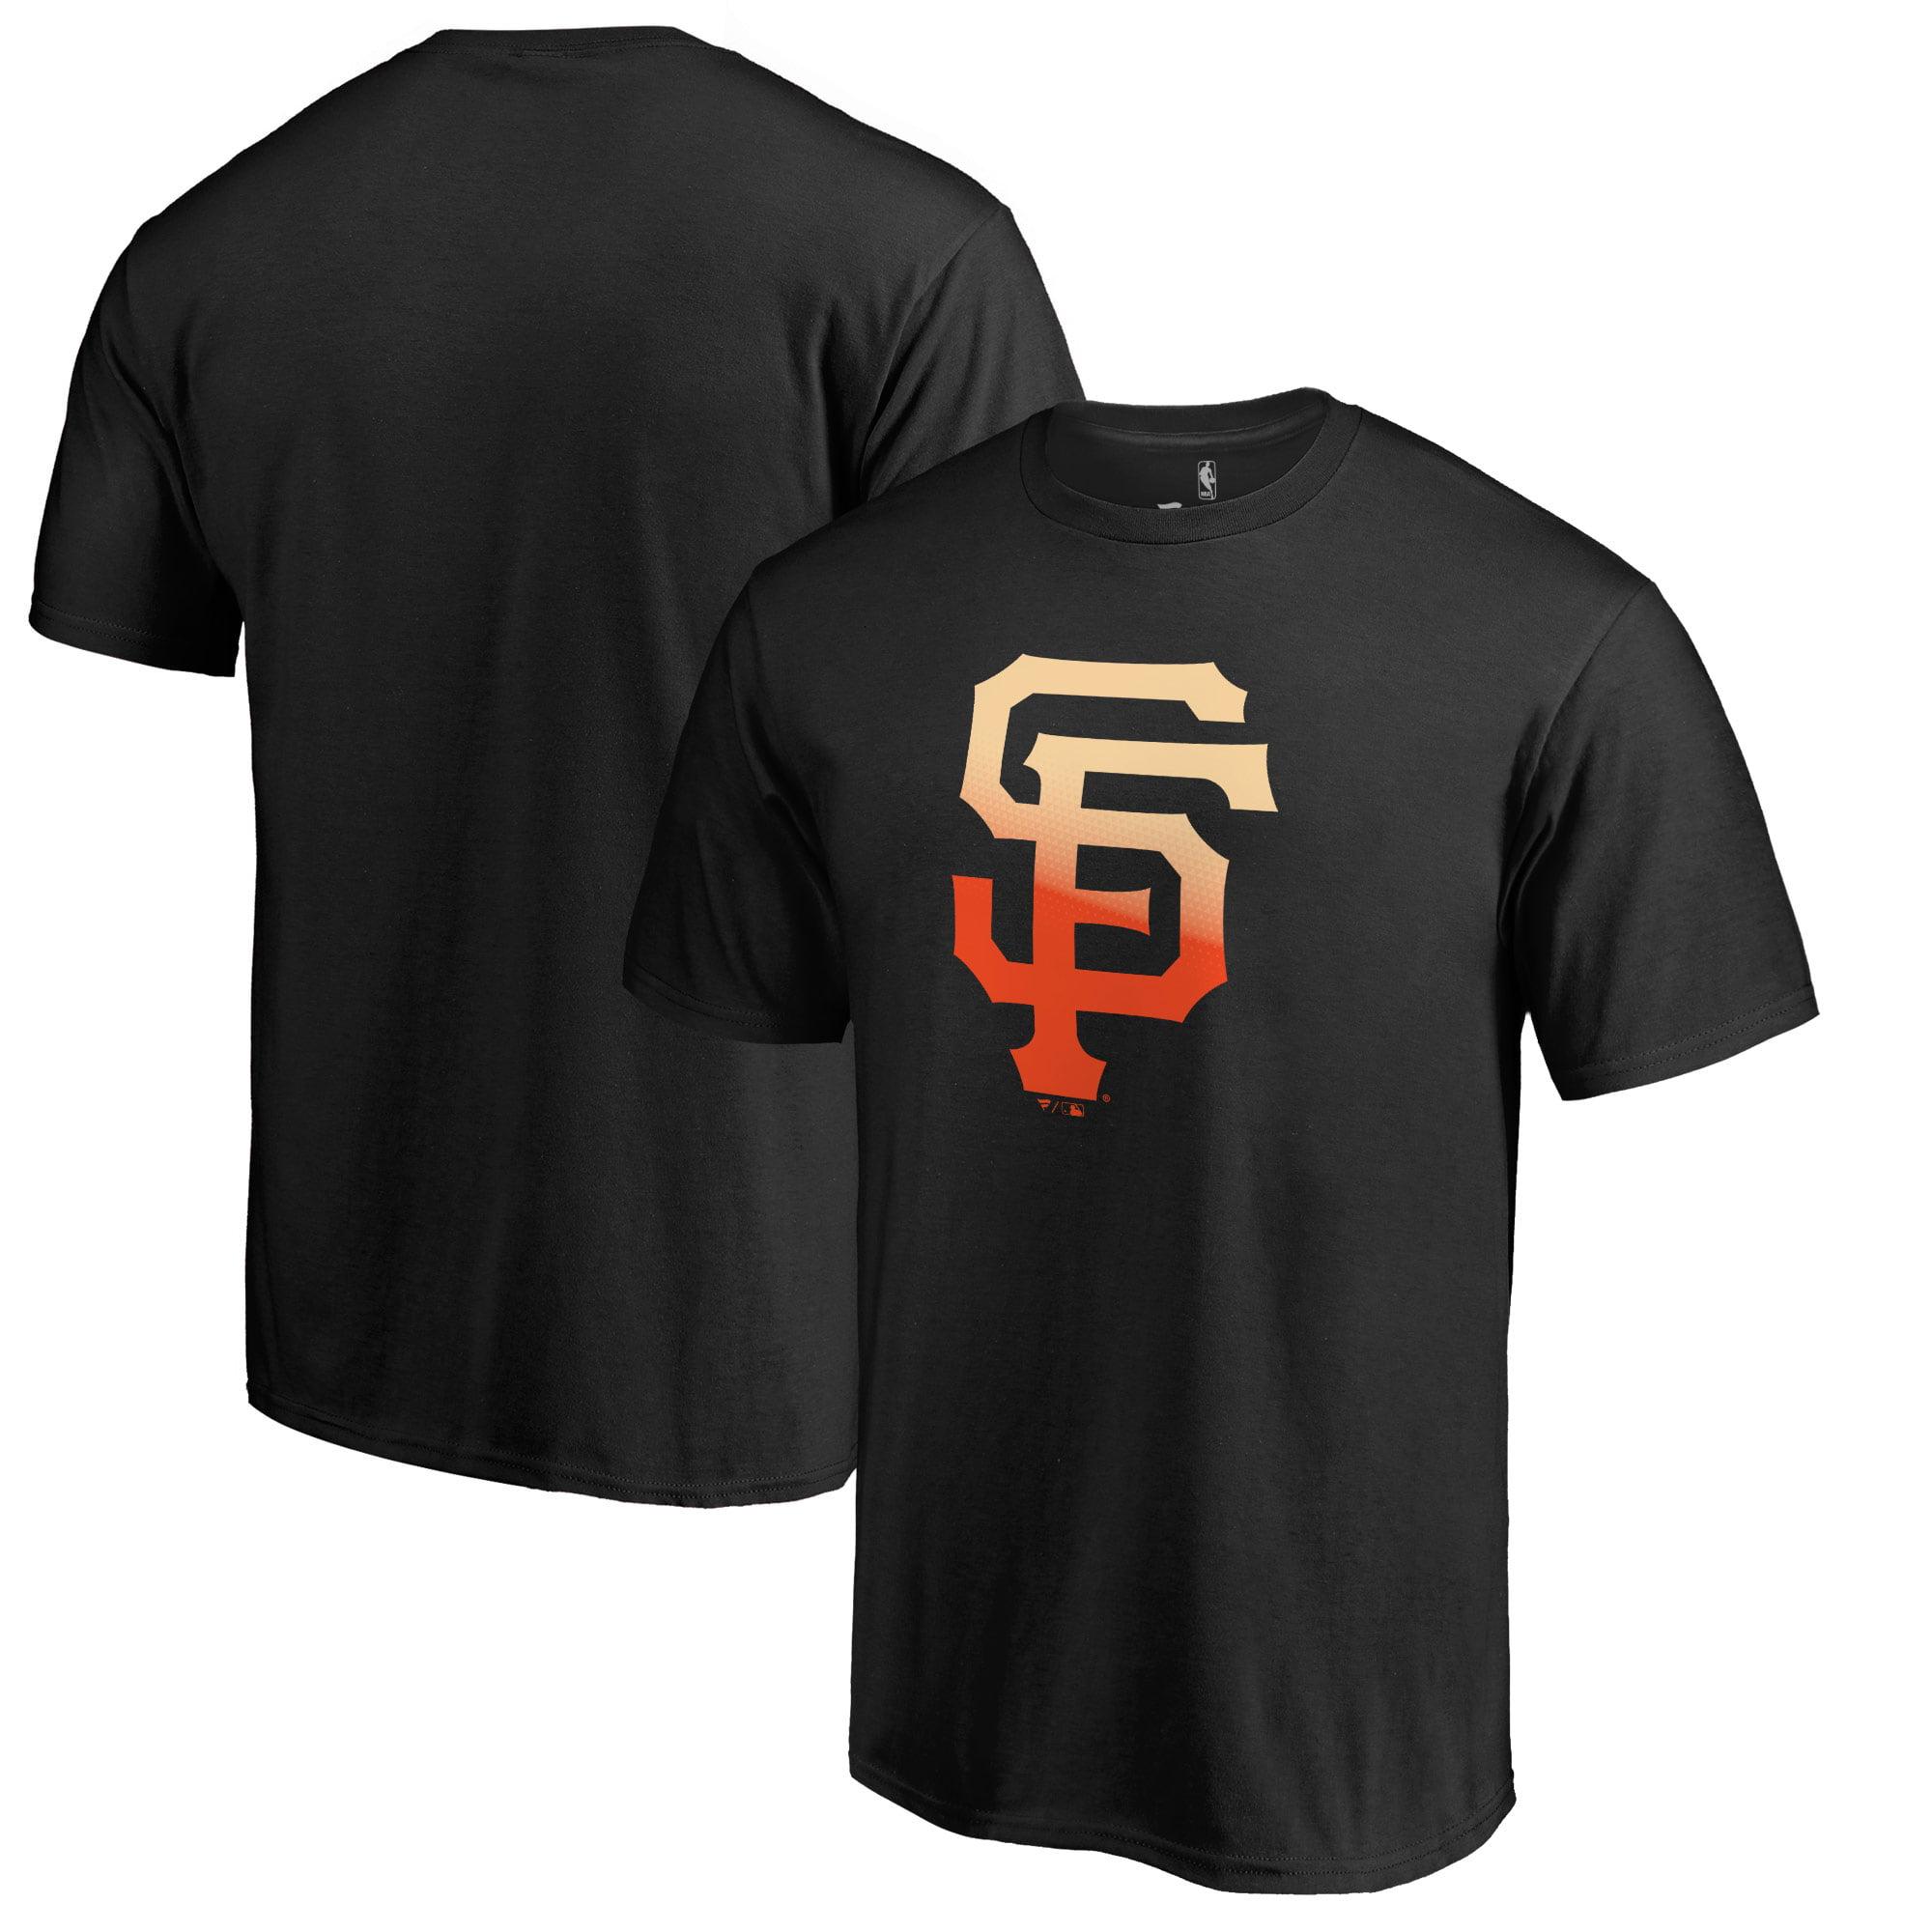 San Francisco Giants Fanatics Branded Gradient Logo T-Shirt - Black